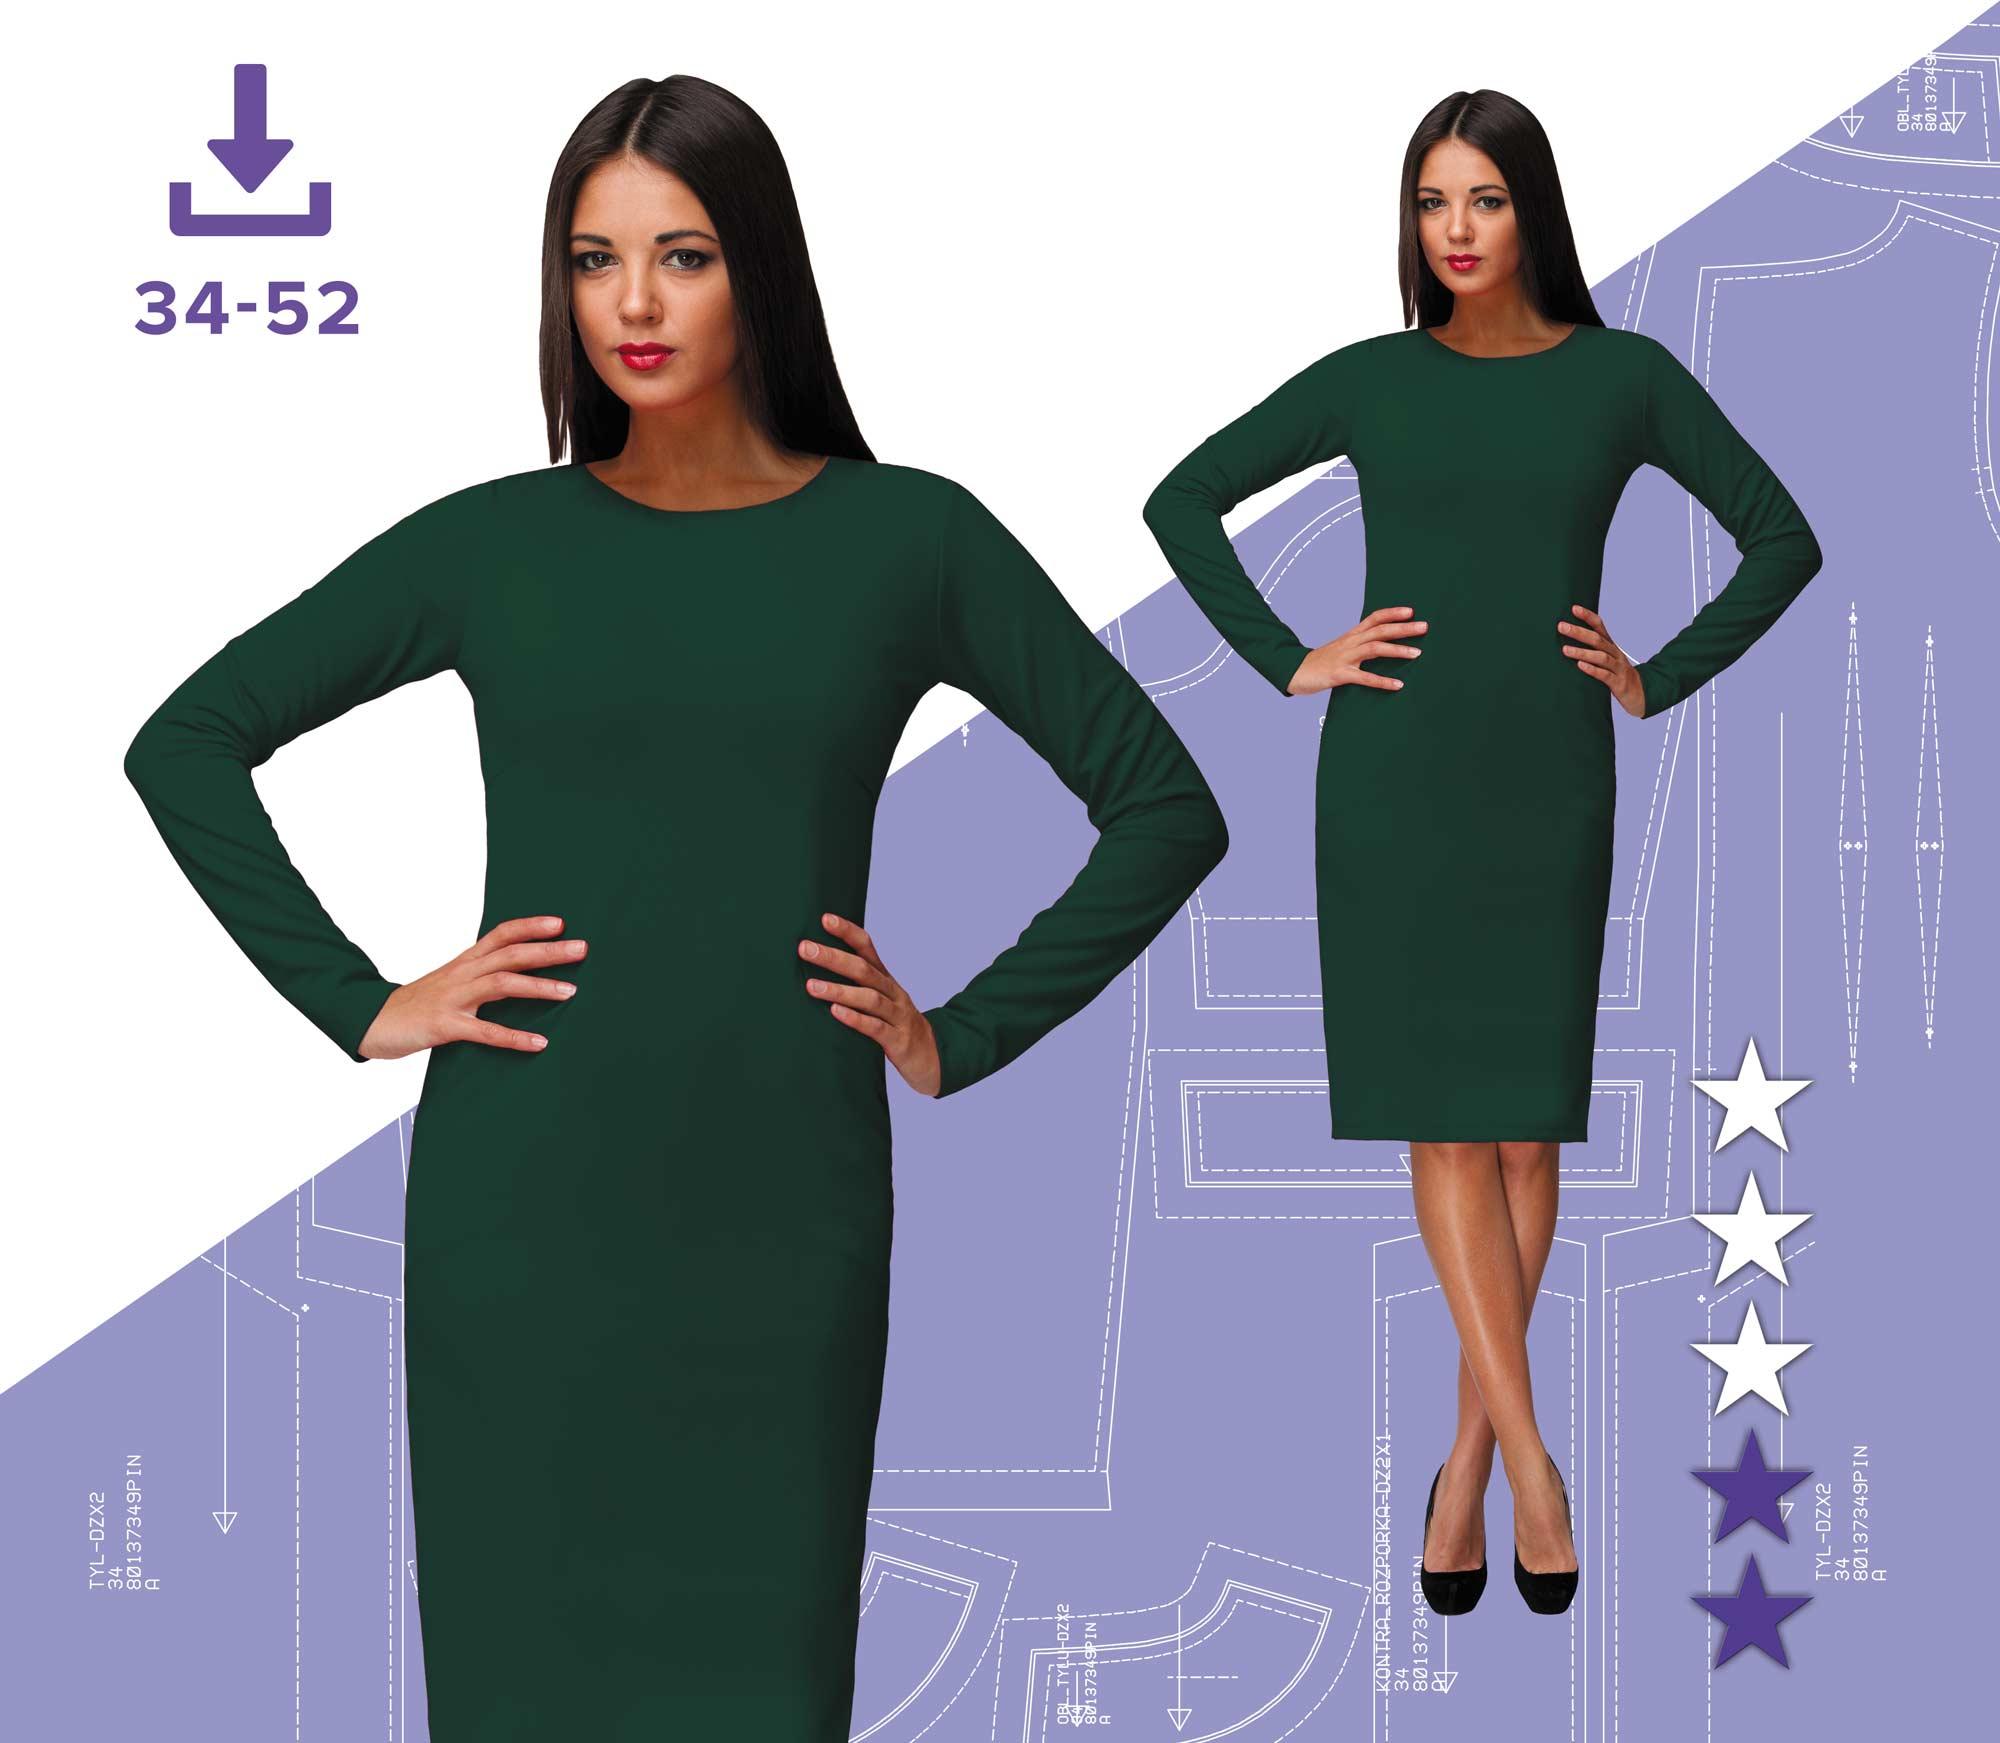 d87acb61 Sukienka Małgosia 34-52 Plik A4 | Pinsola